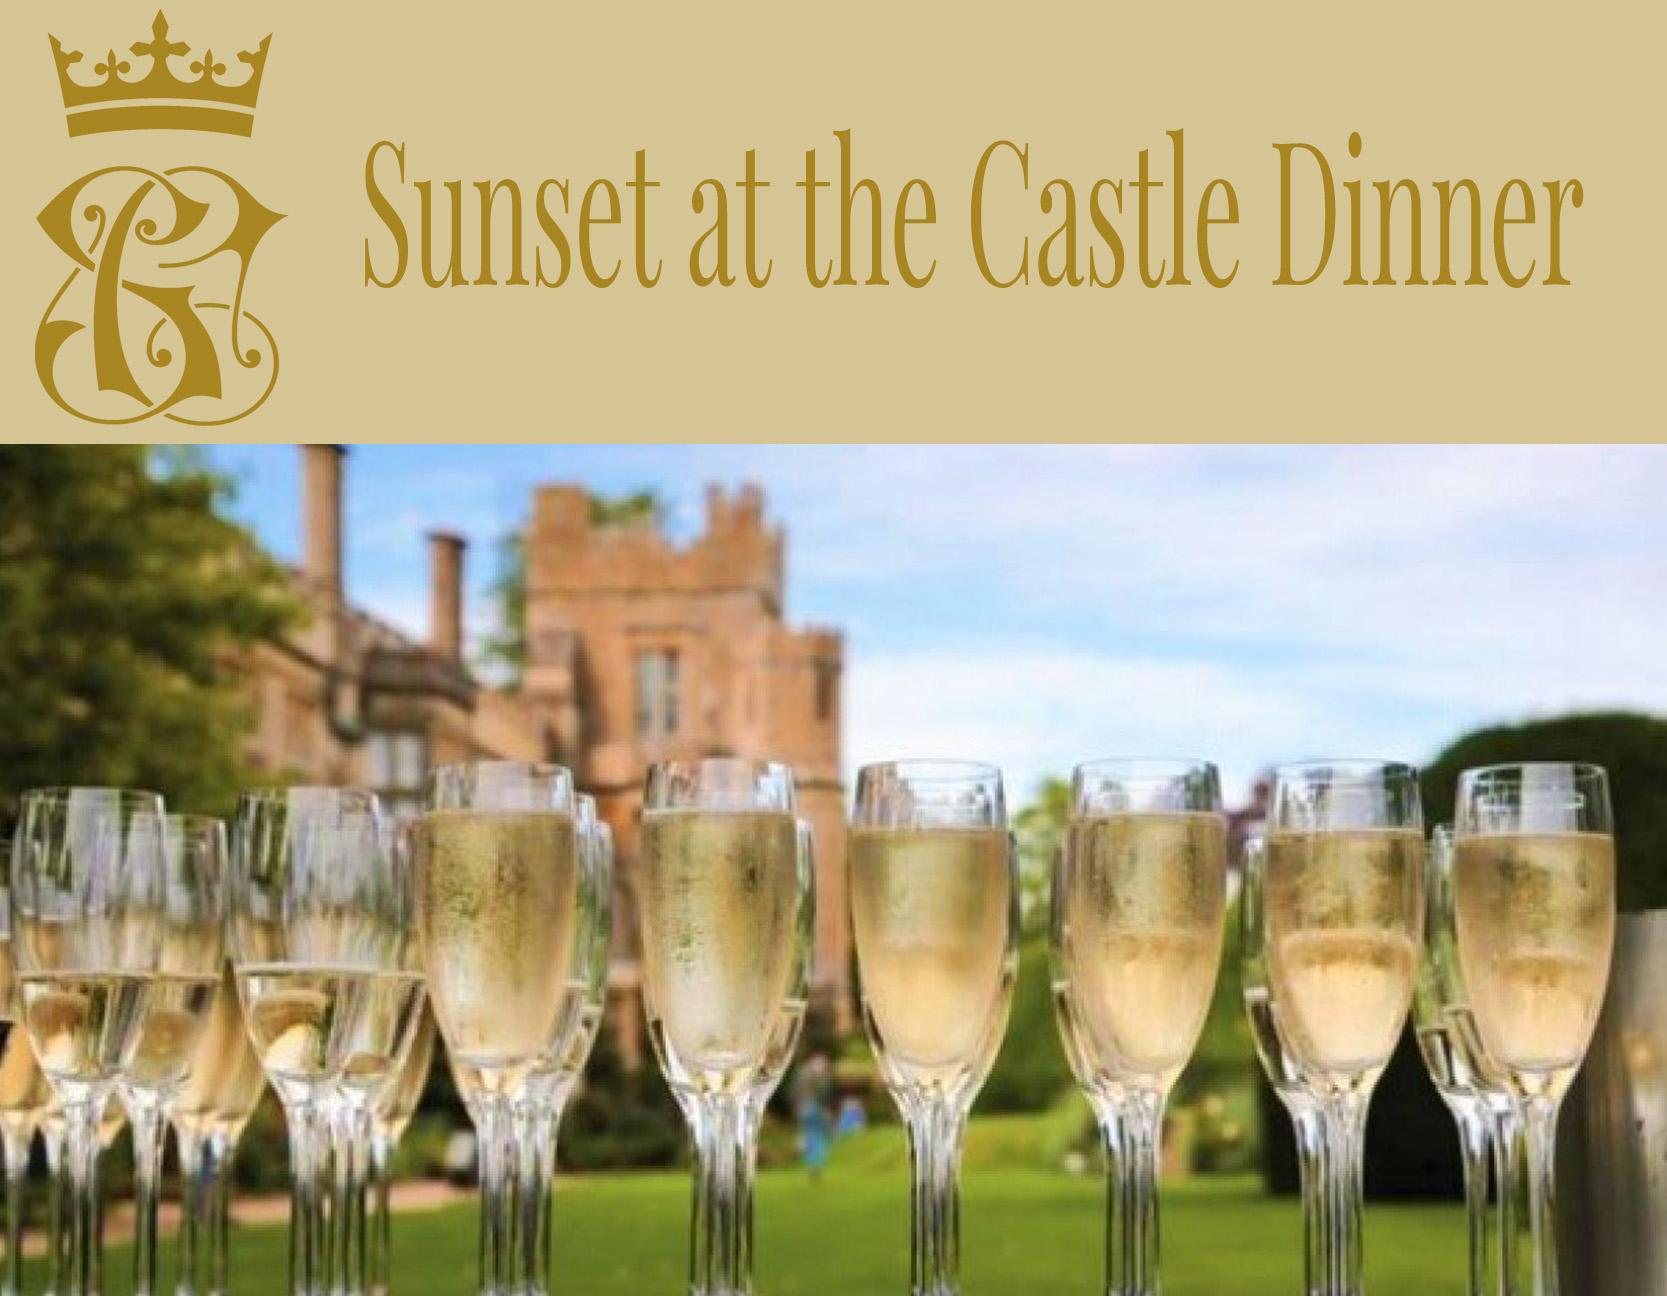 Sunset at the Castle Dinner